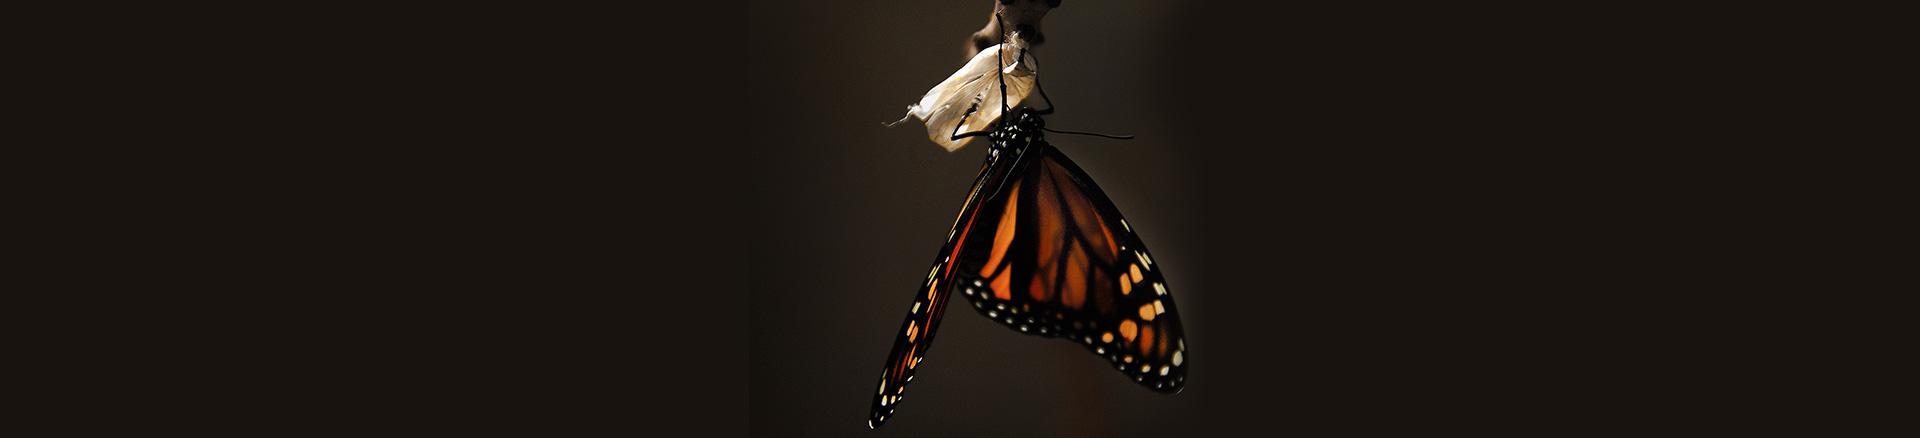 metamorphosis change